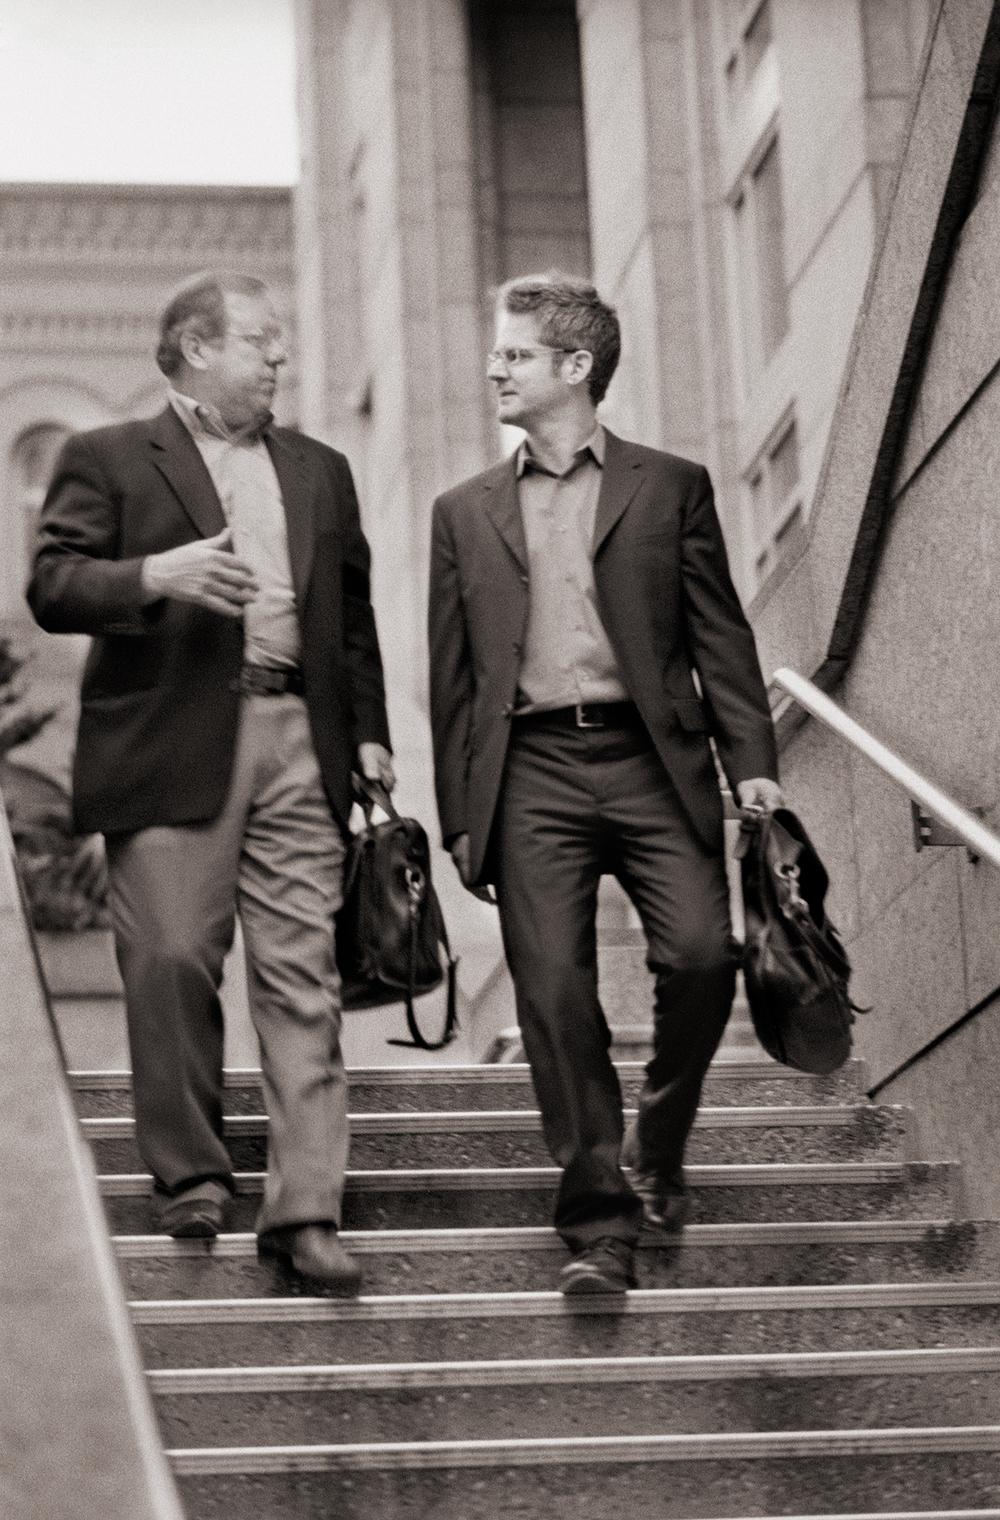 Company executives on the move, Strategies 360